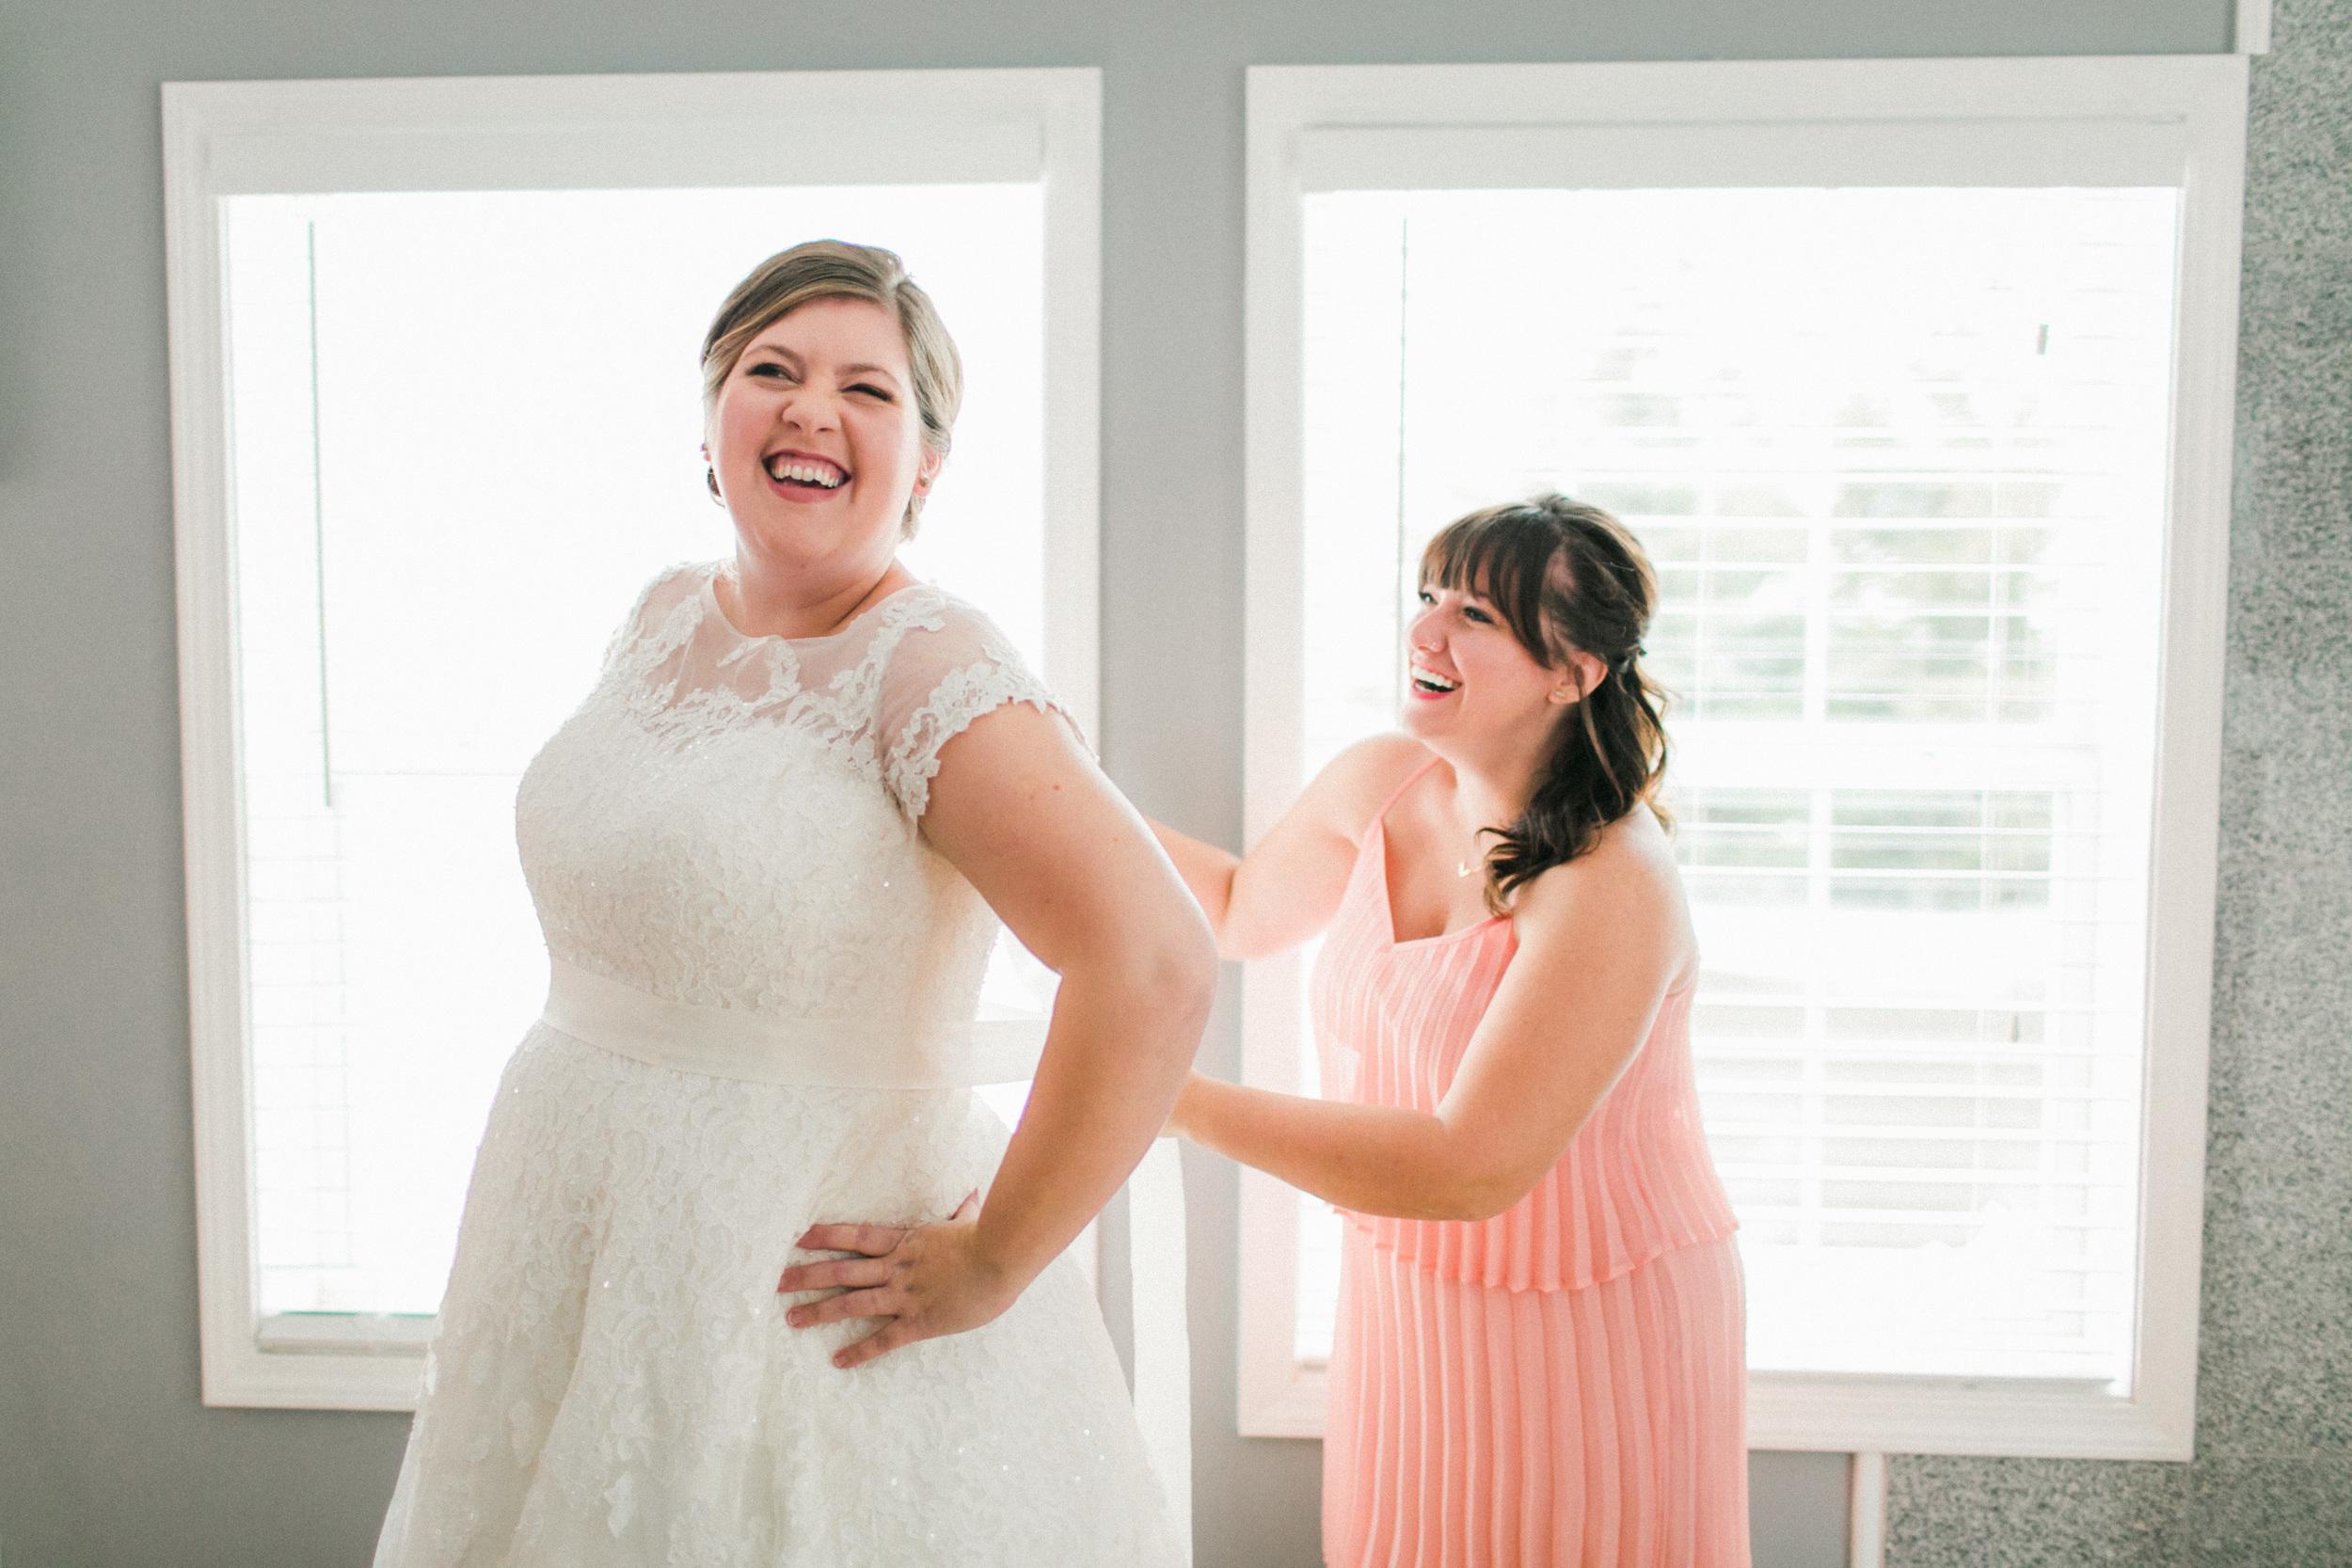 mayden photography_bridal portraits-10.jpg